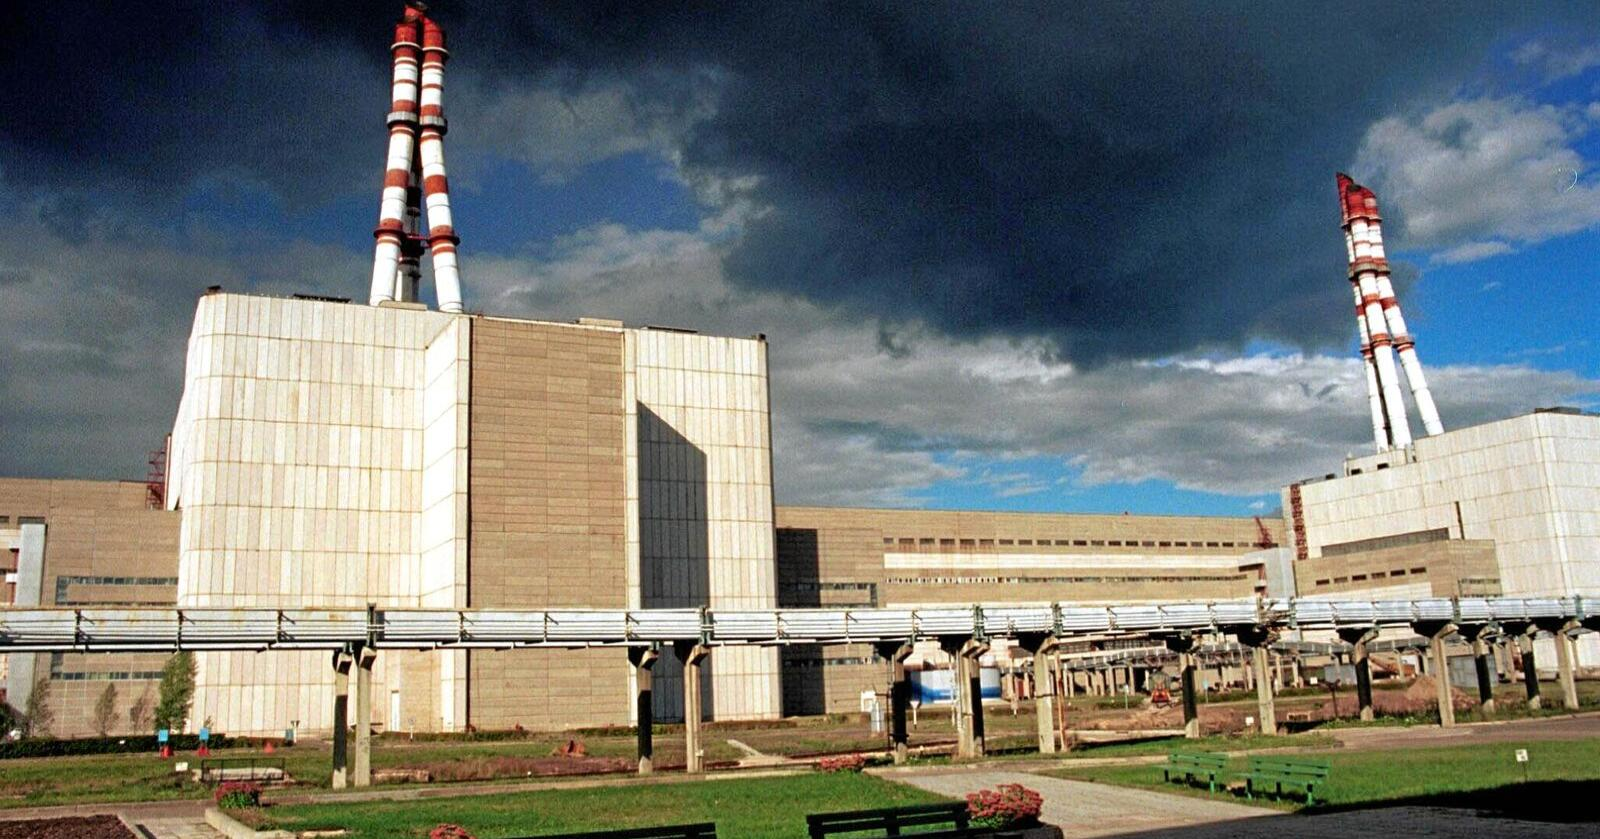 Kraftverk som Ignalina i Litauen (bildet) gir restavfall som er farlig i århundrer.  Foto: Nordbild